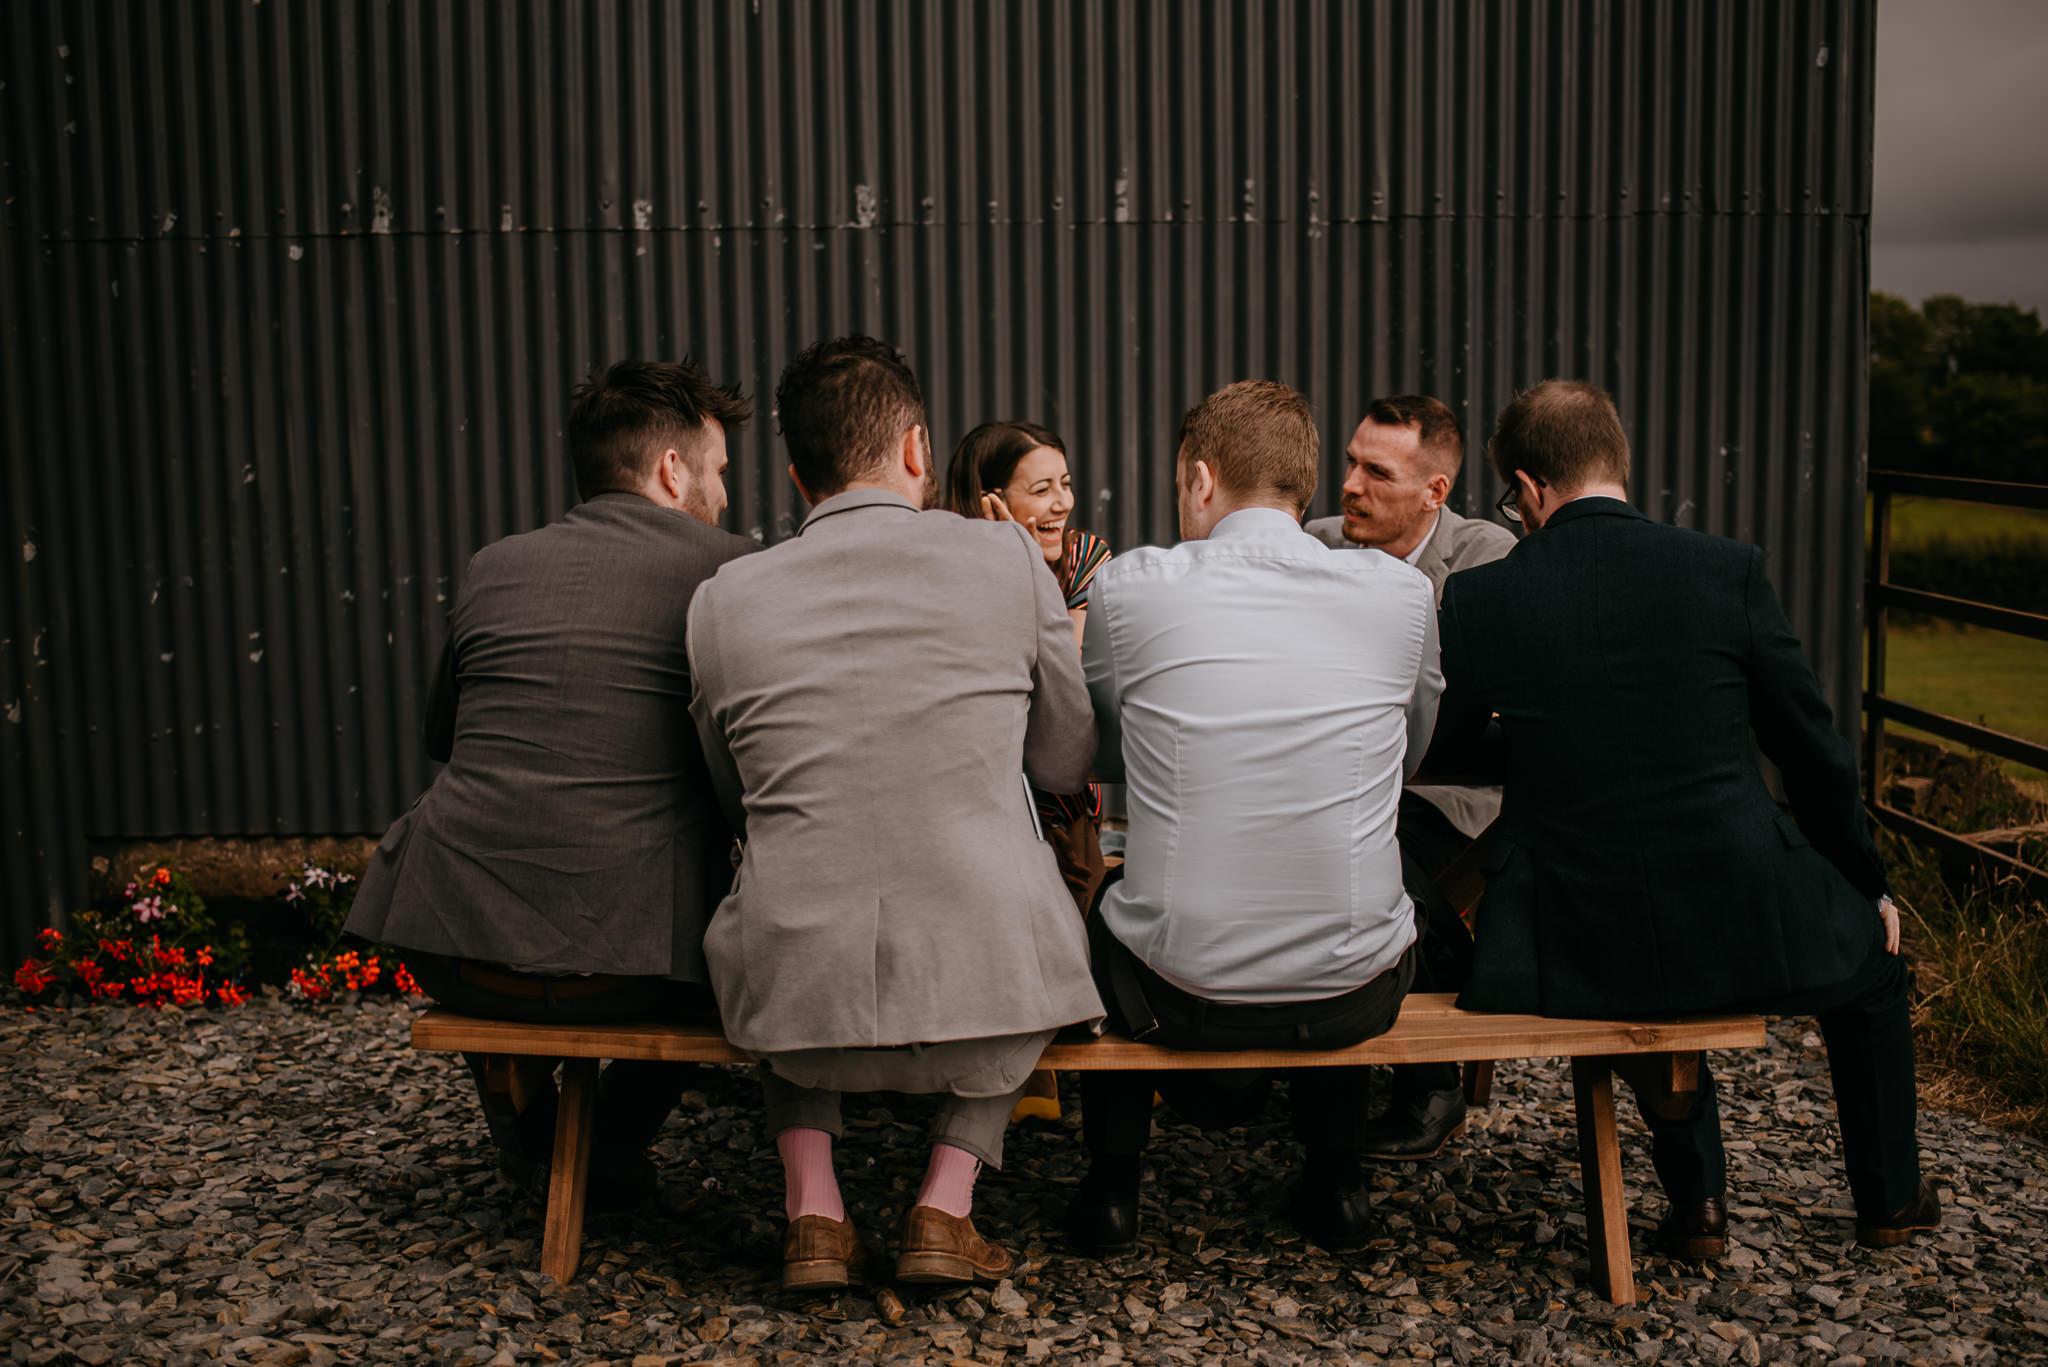 Northern-Ireland-wedding-photographers-the-martins-outdoor-barn-wedding-120.jpg